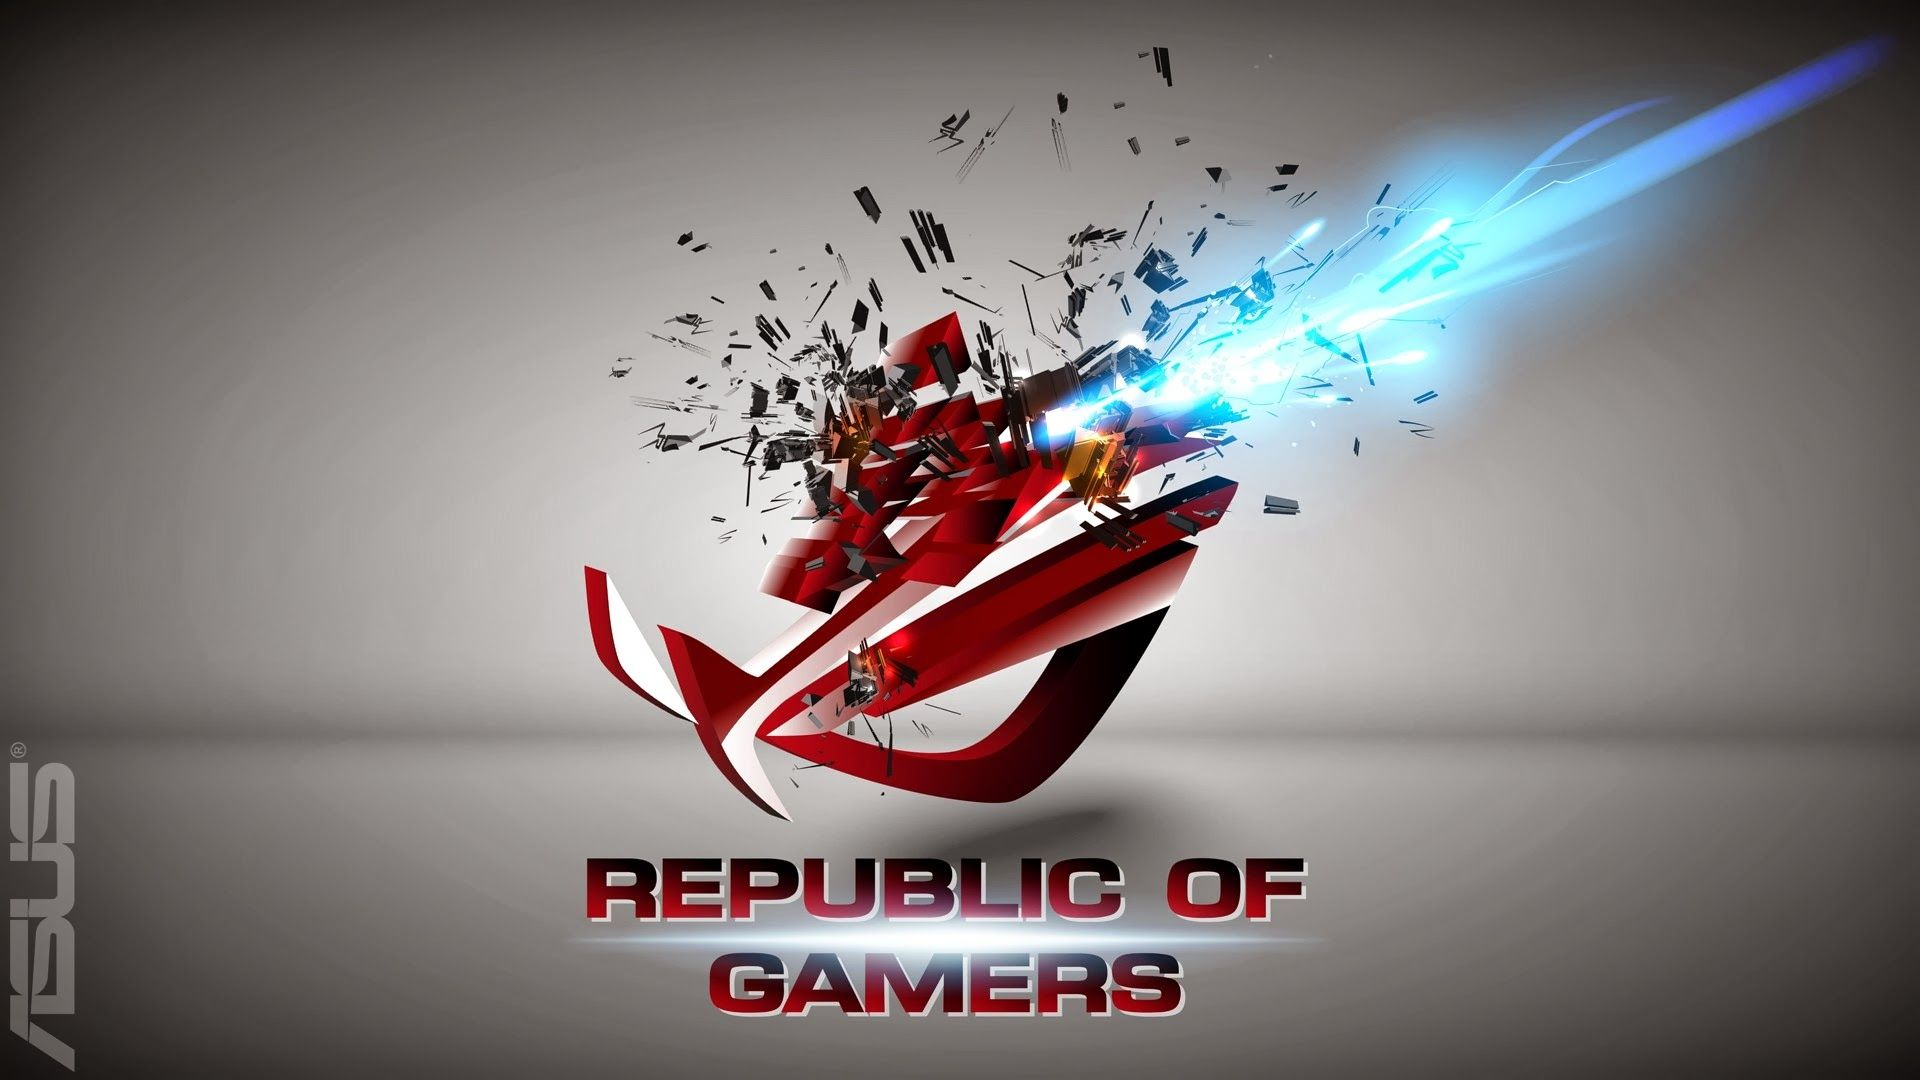 Pics photos rog blue background republic of gamers asus gamer asus - Cool Asus Rog Republic Of Gamers Hd Wallpaper